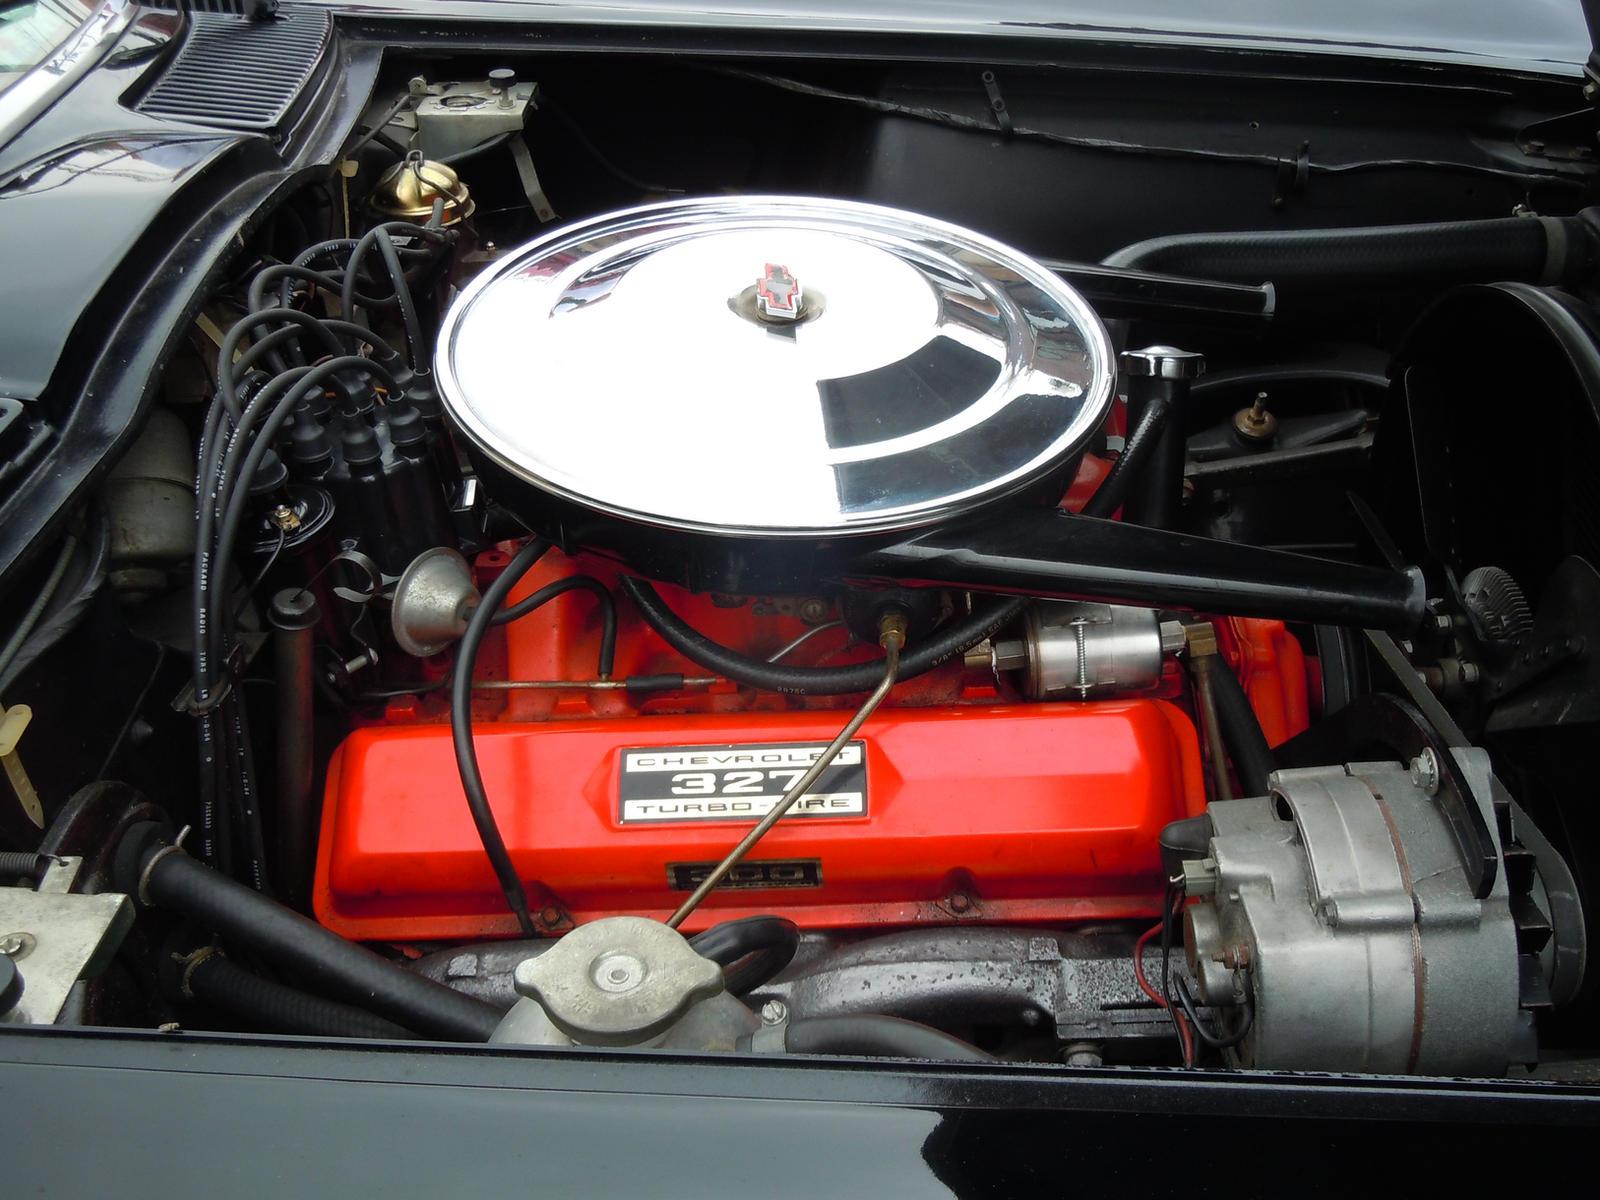 1964 chevrolet corvette 327 turbo fire engine by for Chevy truck with corvette motor